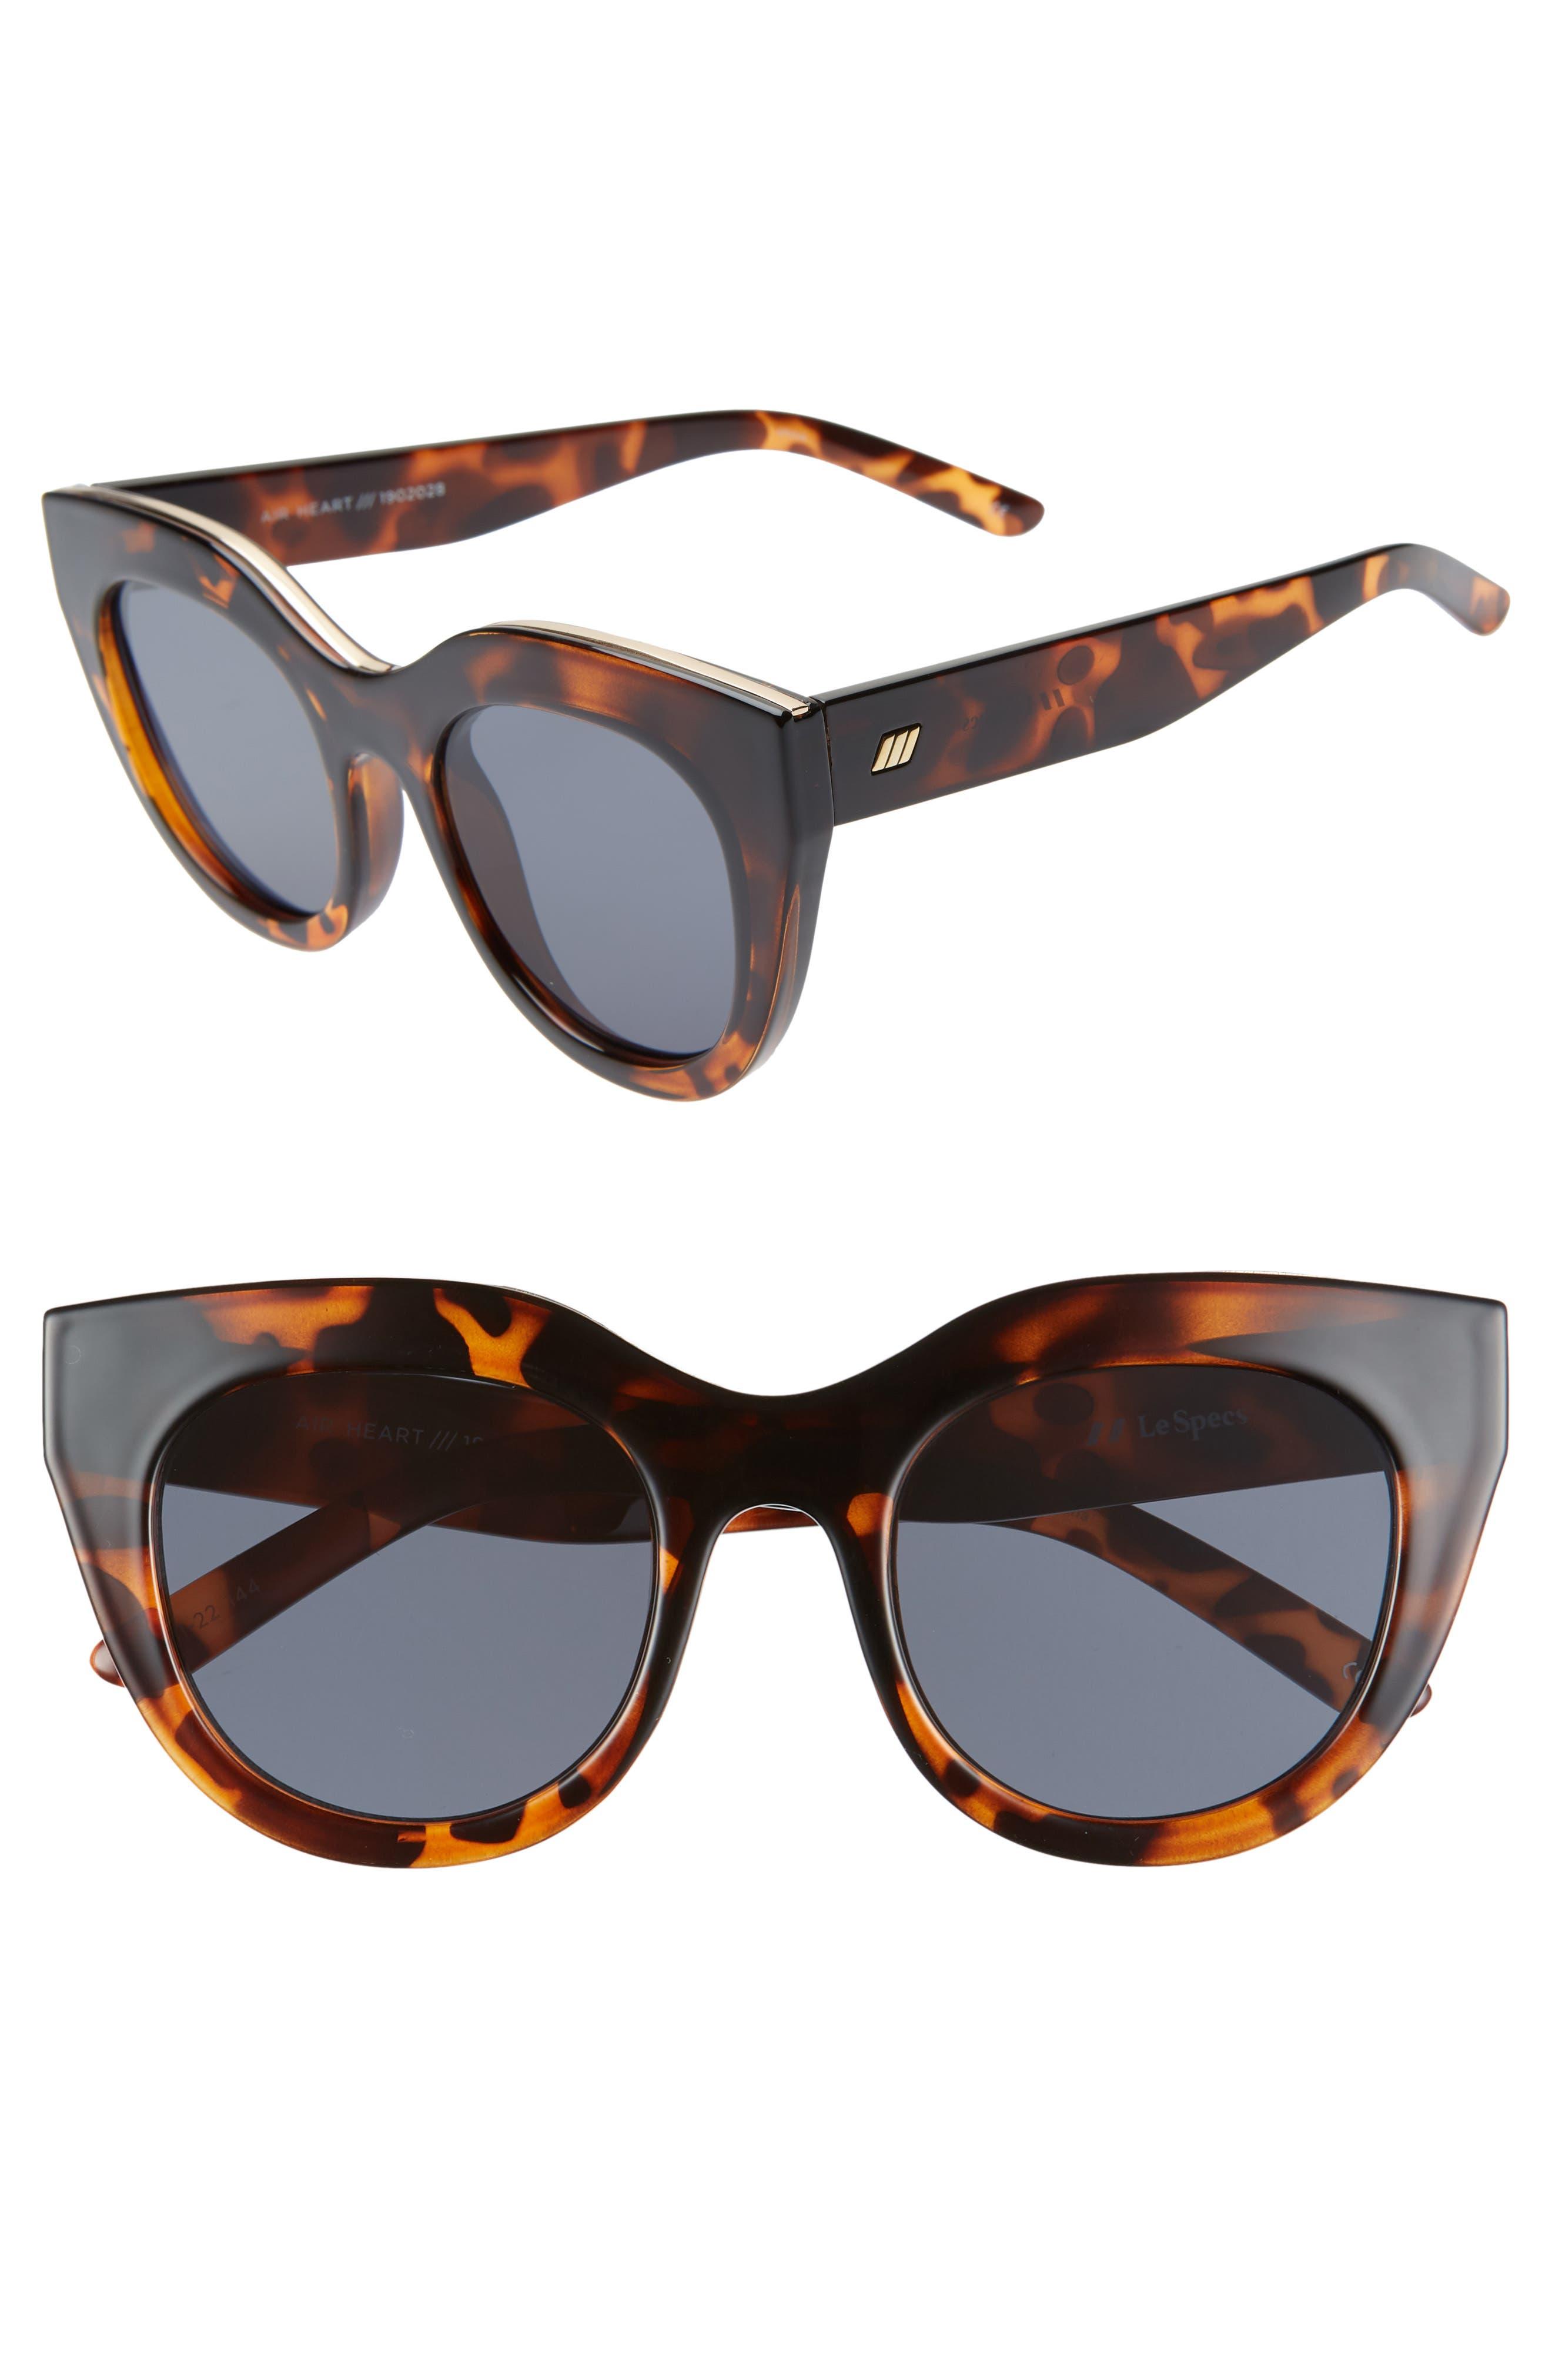 a0535f61ac2 Le Specs Sunglasses for Women